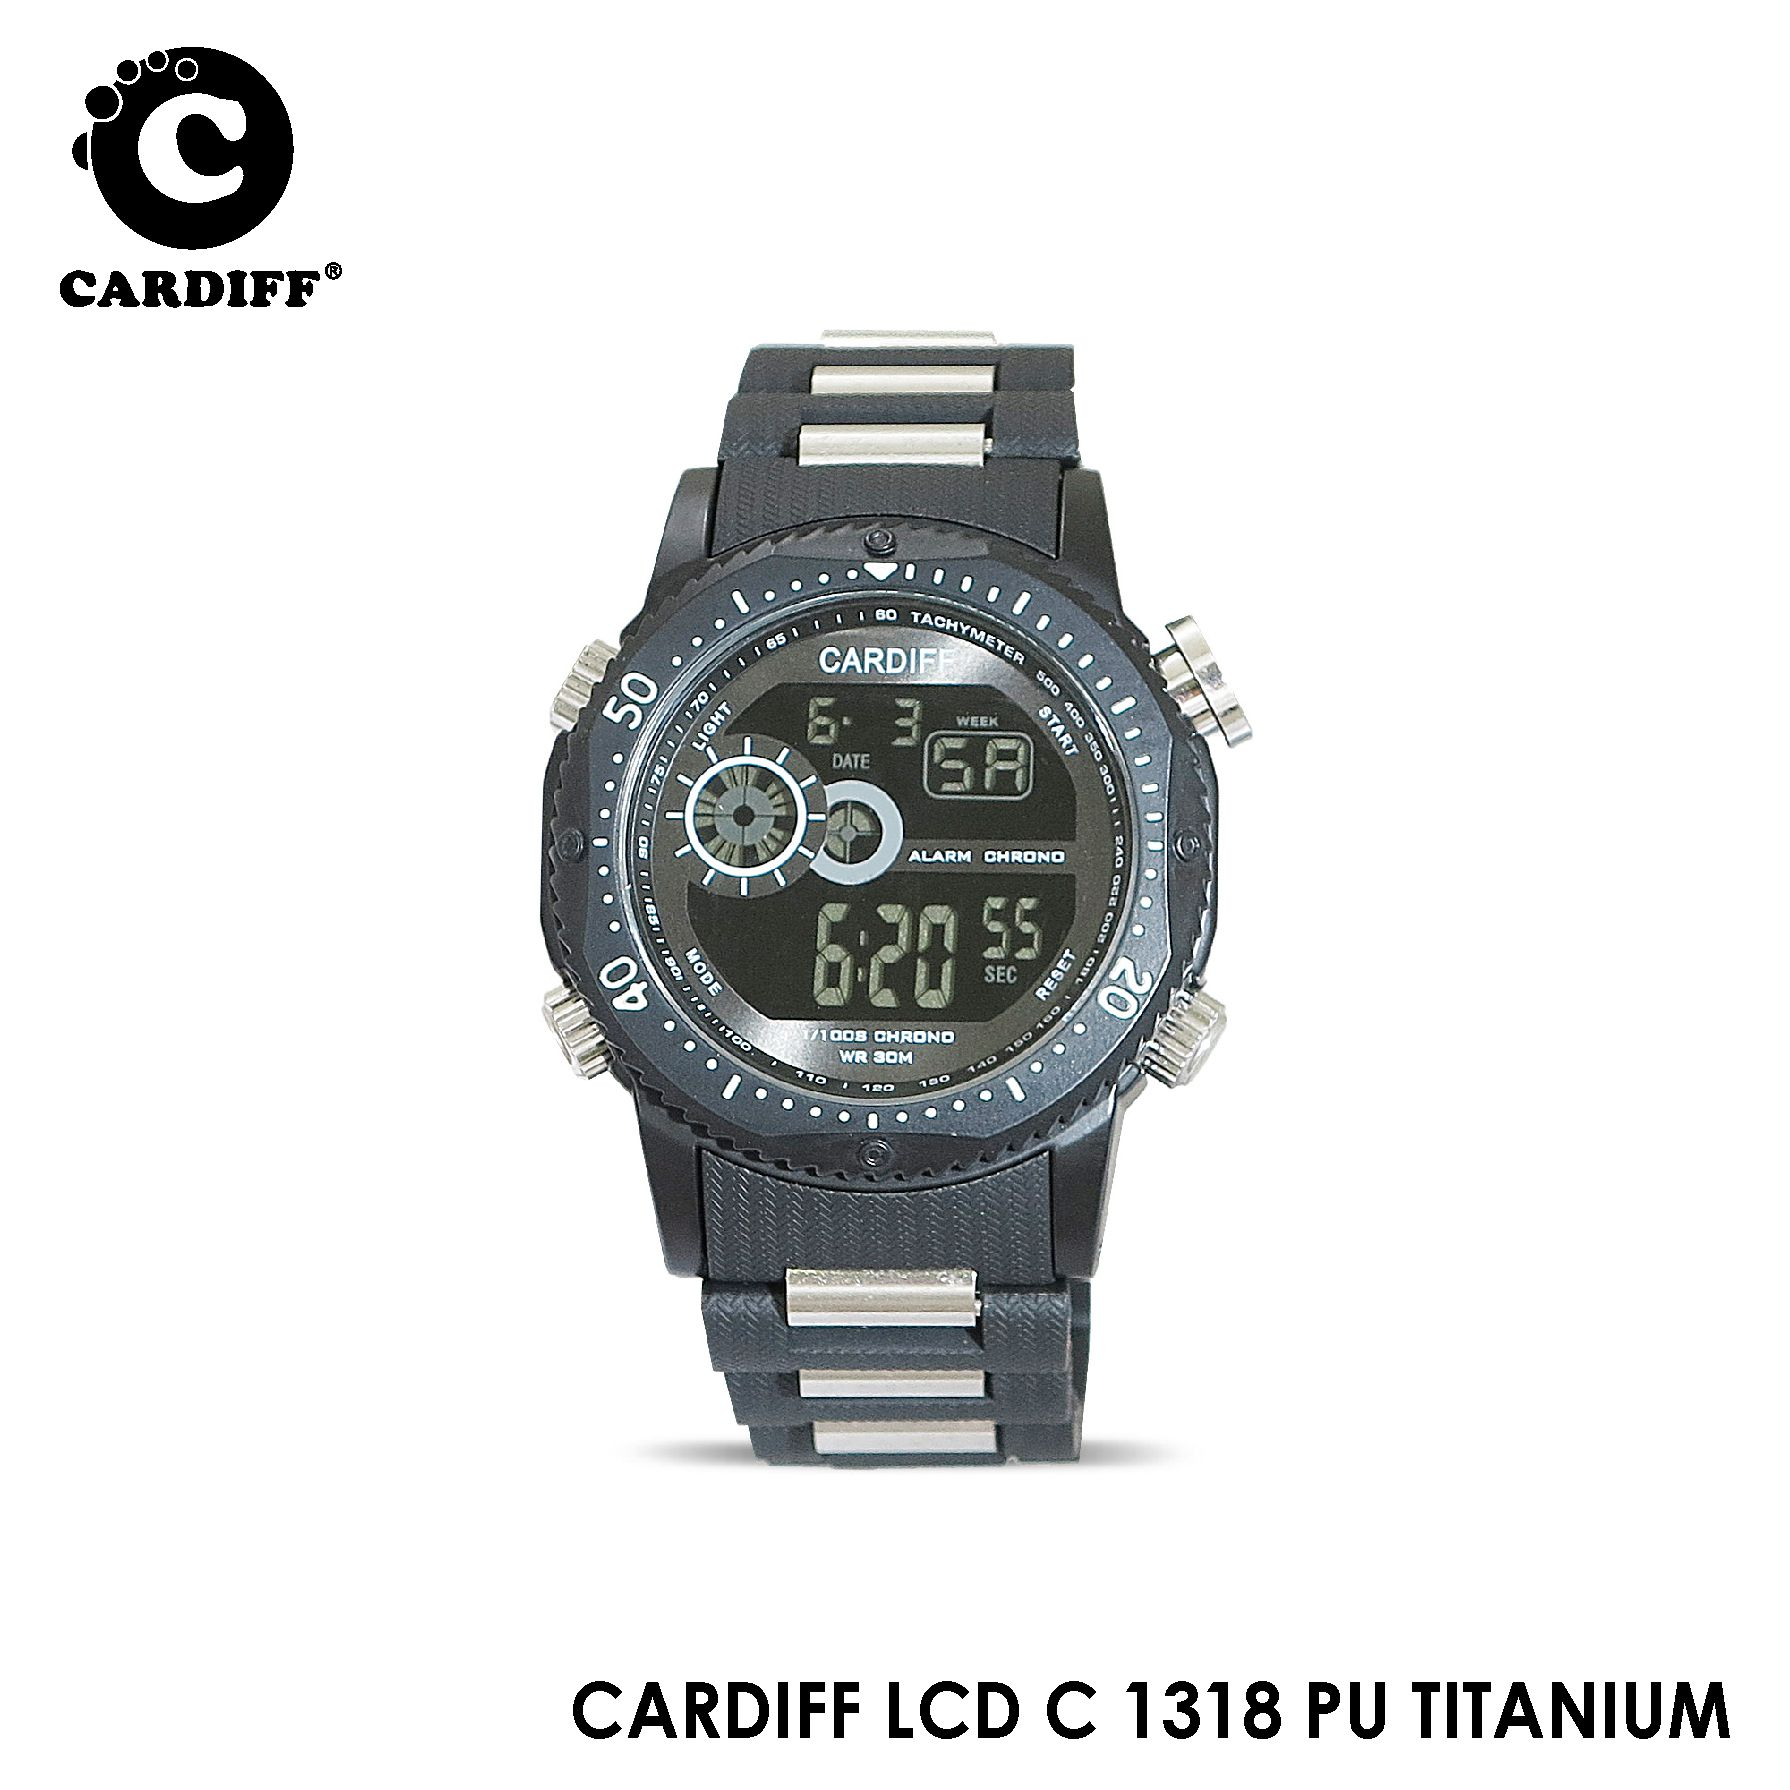 Cardiff LCD 1318